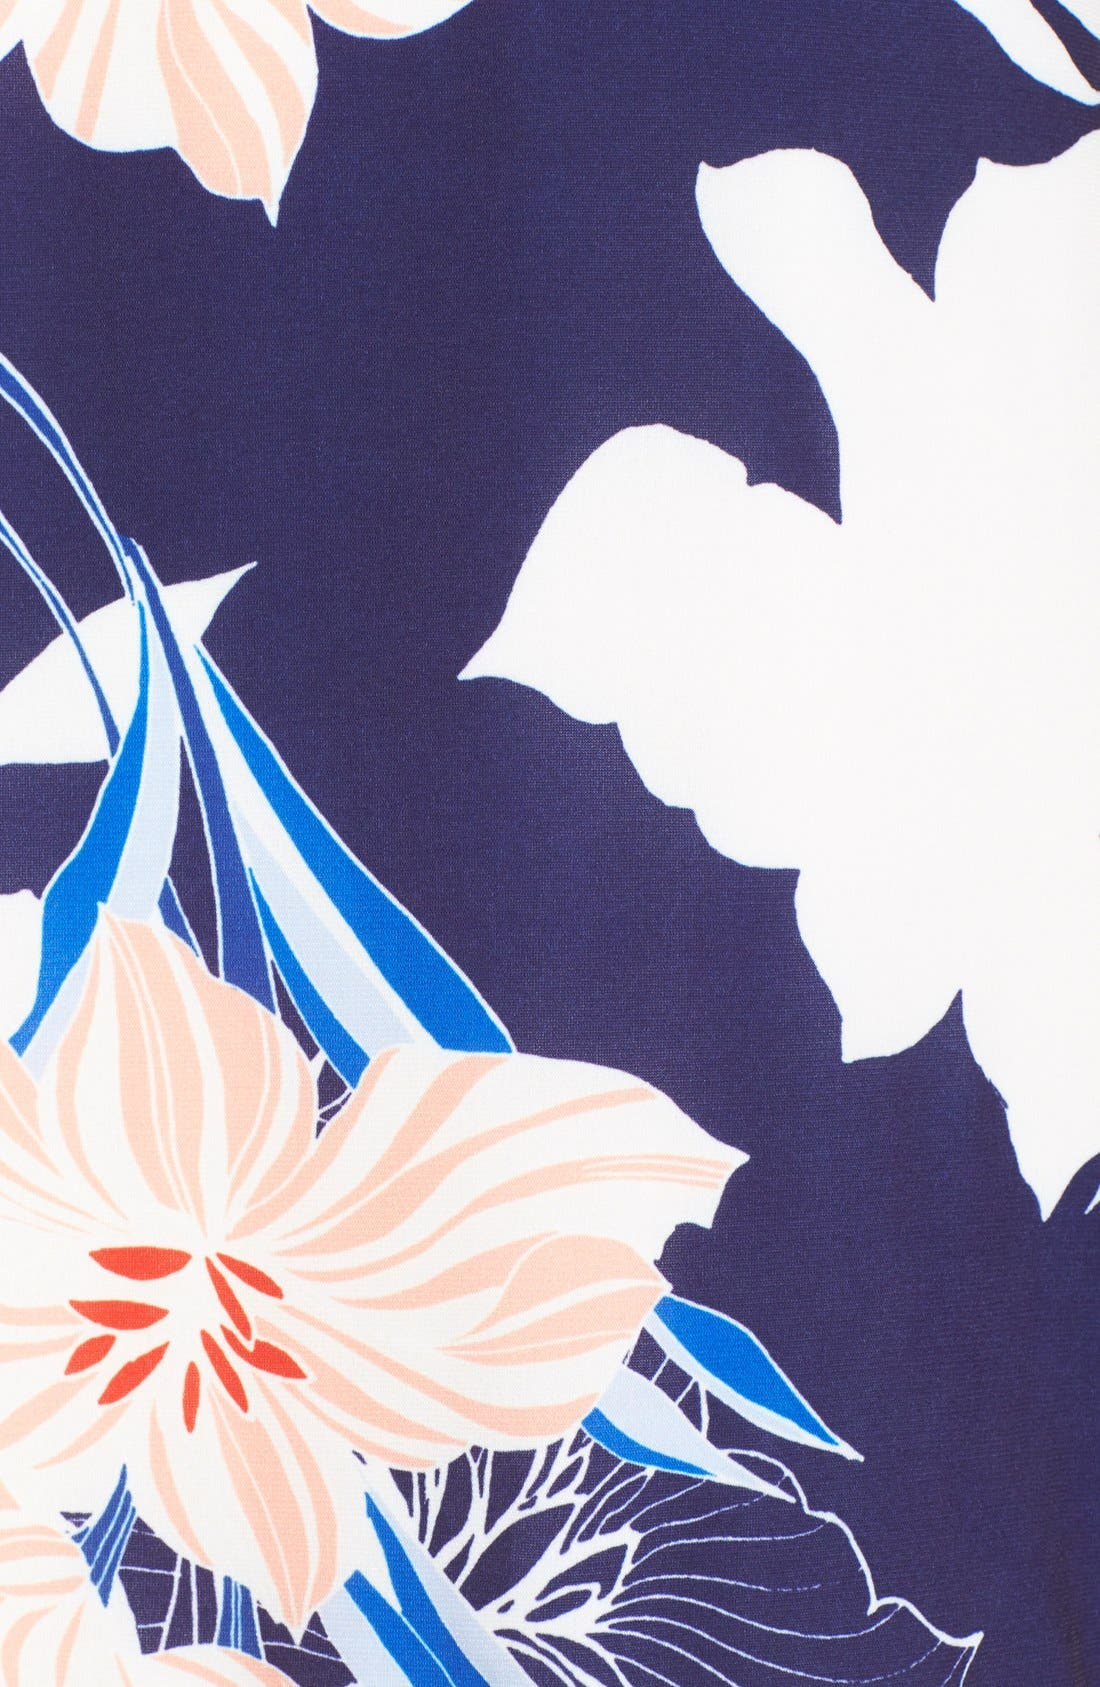 Floral Jersey Shift Dress,                             Alternate thumbnail 4, color,                             410